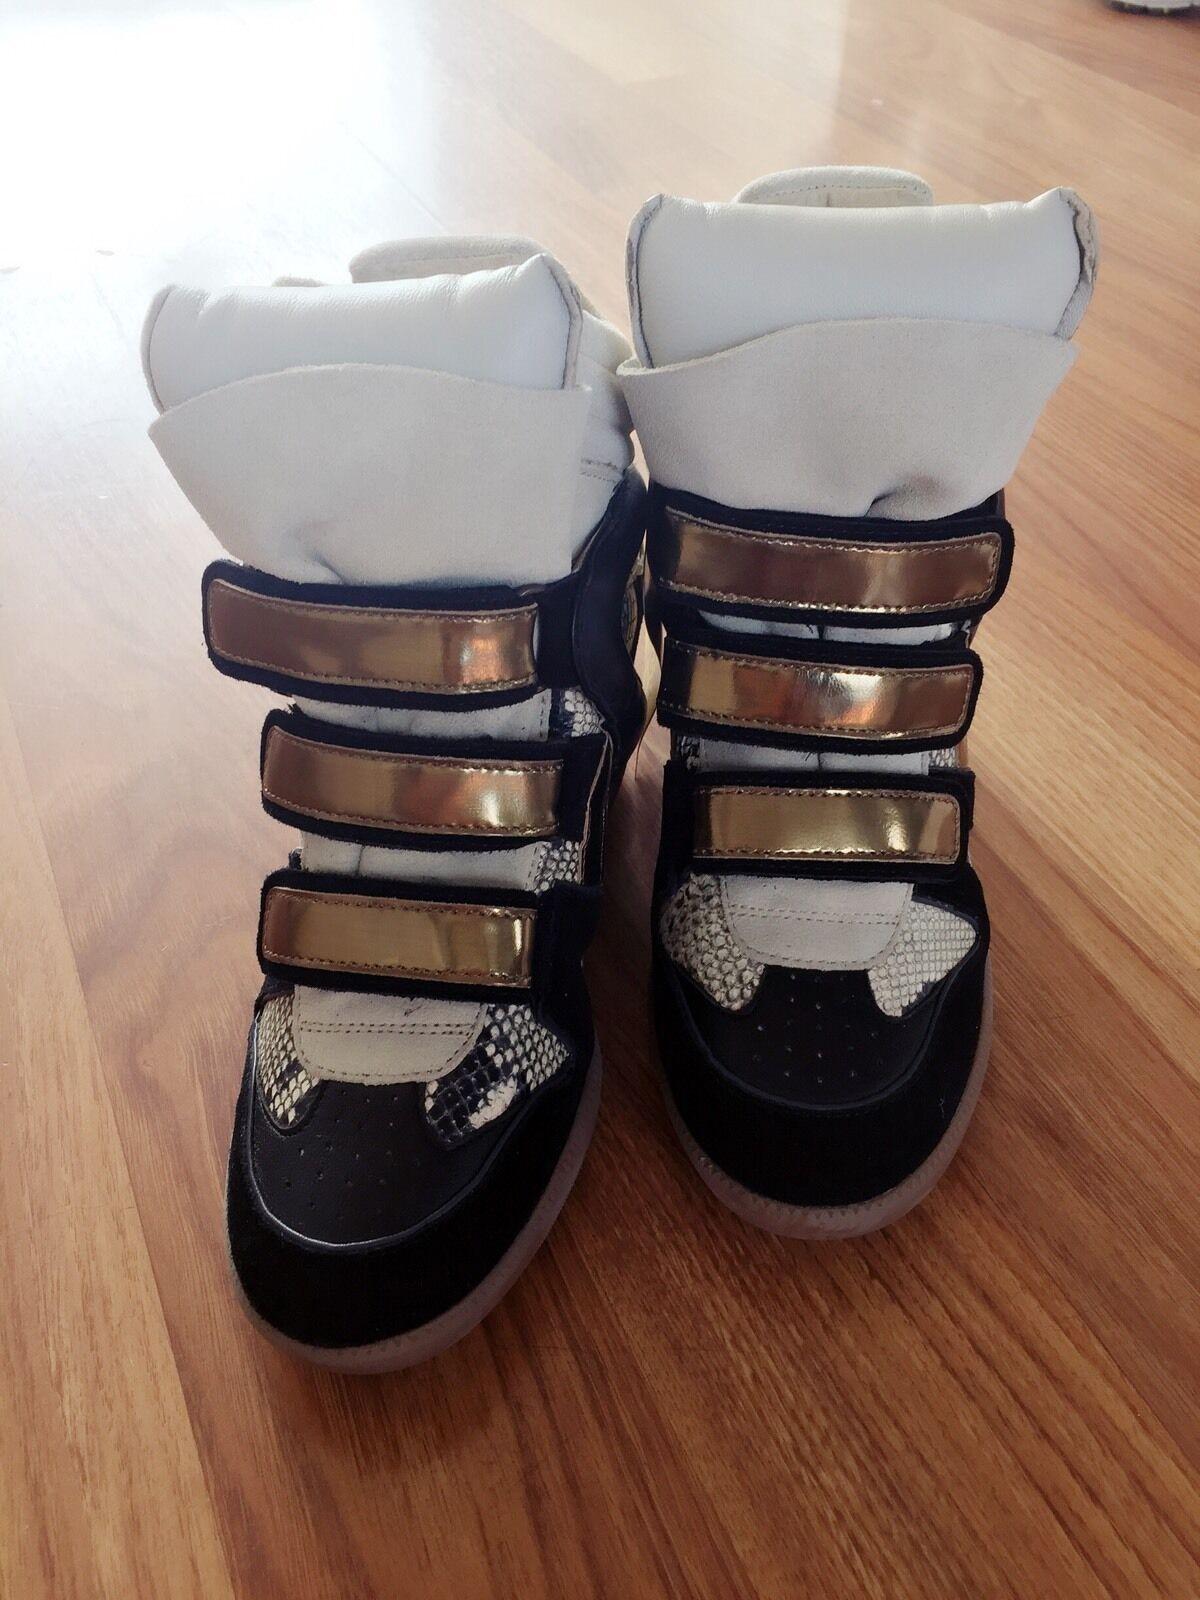 Isabel Marant Etoile Etoile Etoile skor UK Storlek 4  vara i stor efterfrågan